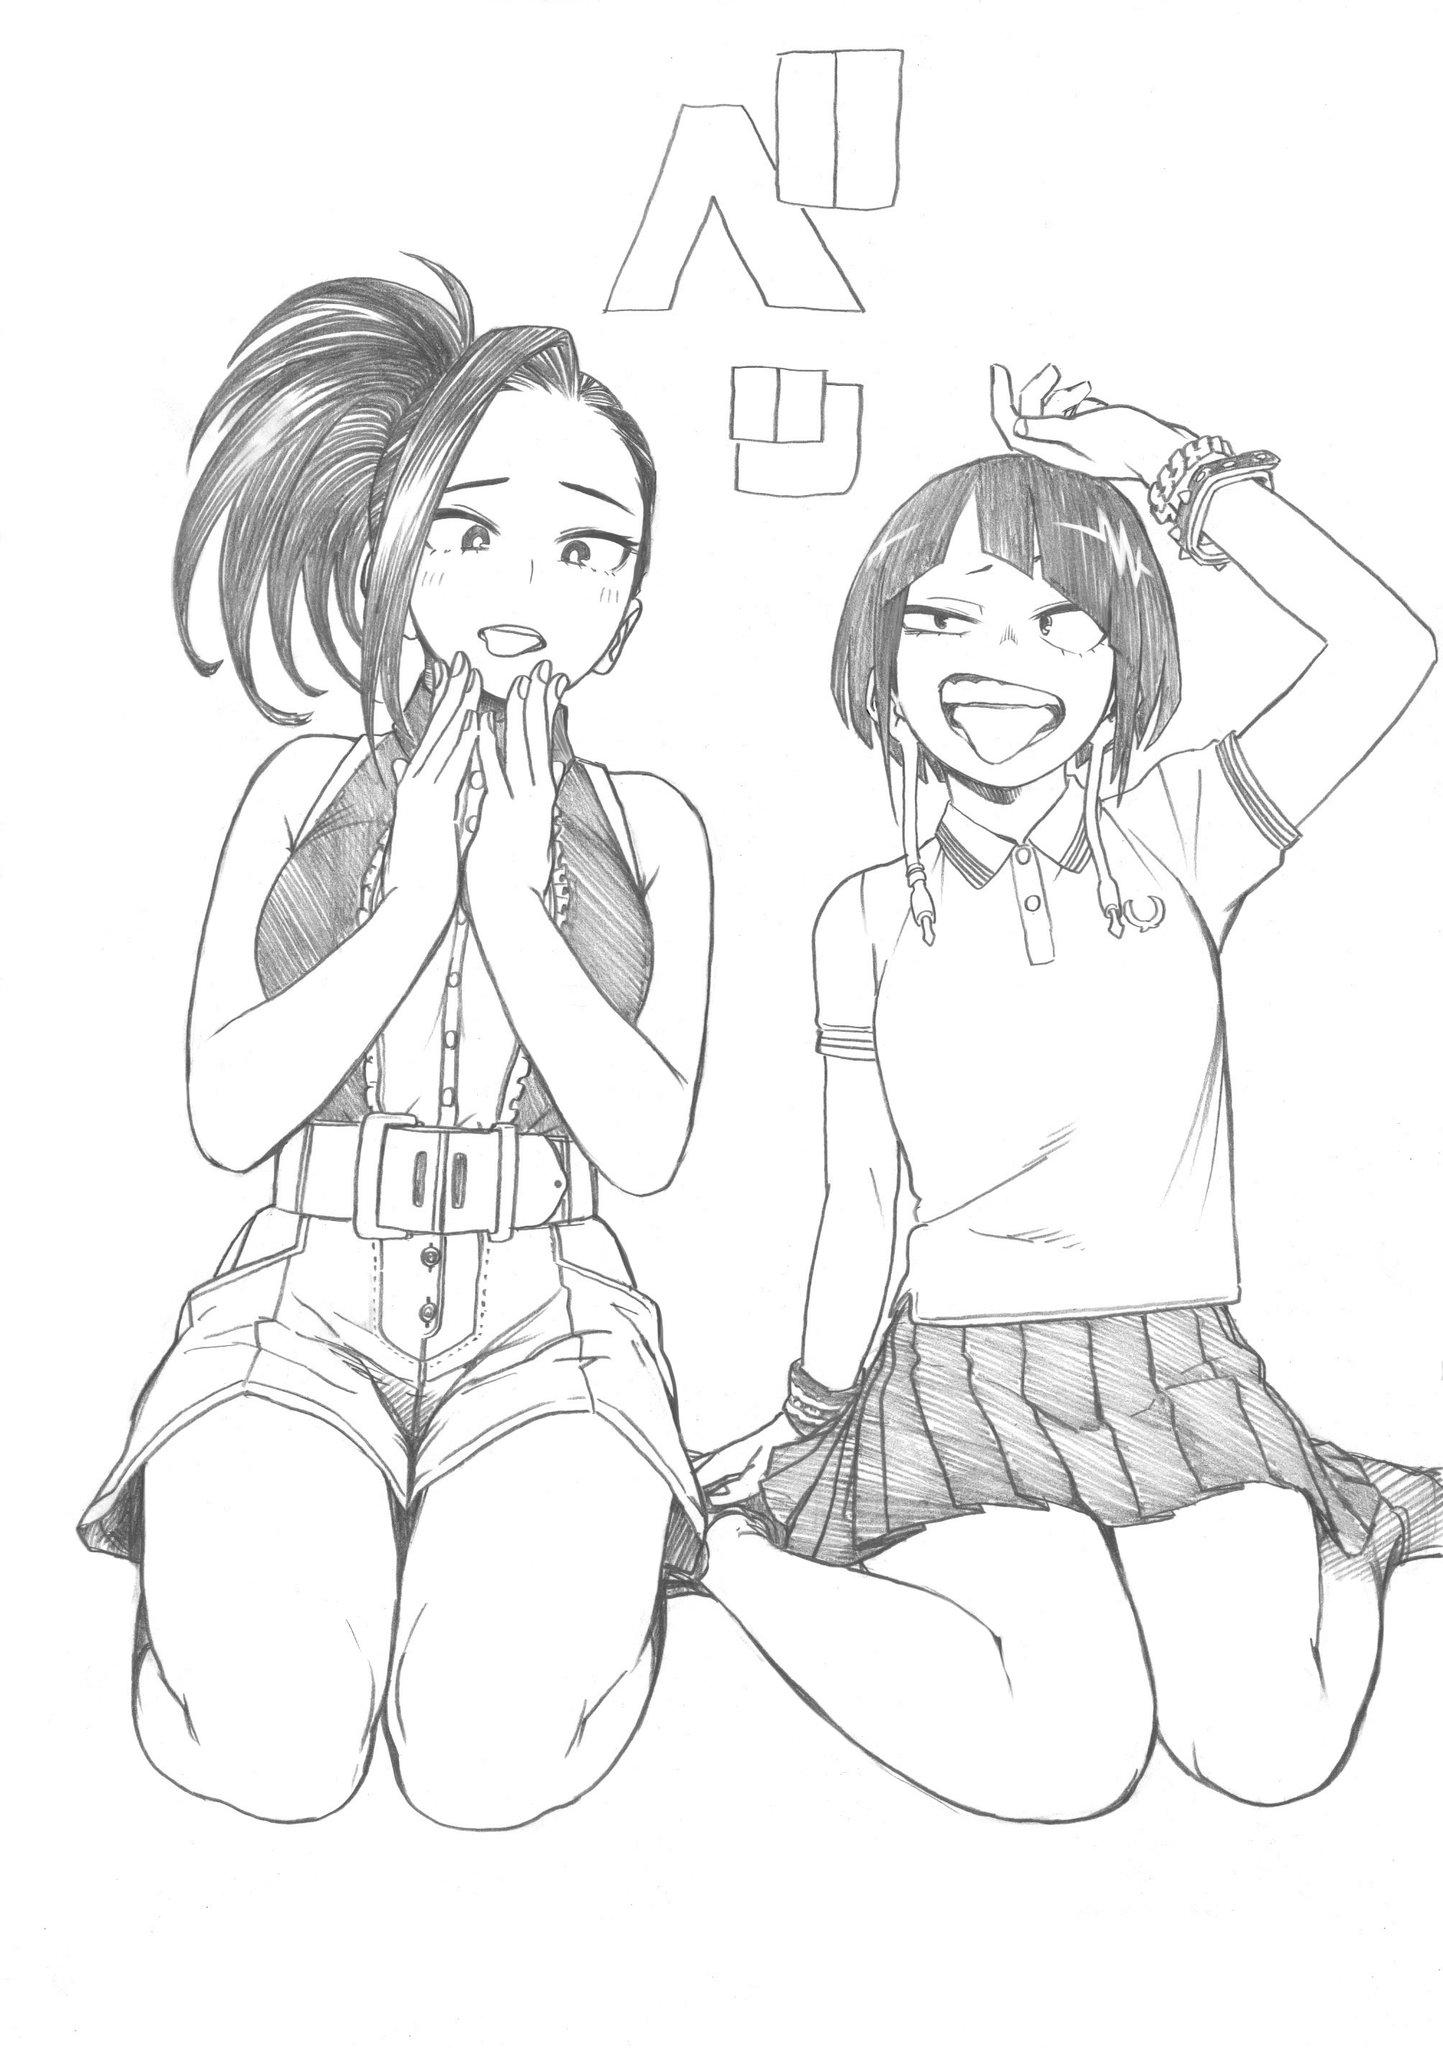 Momo and Kyoka Sketch